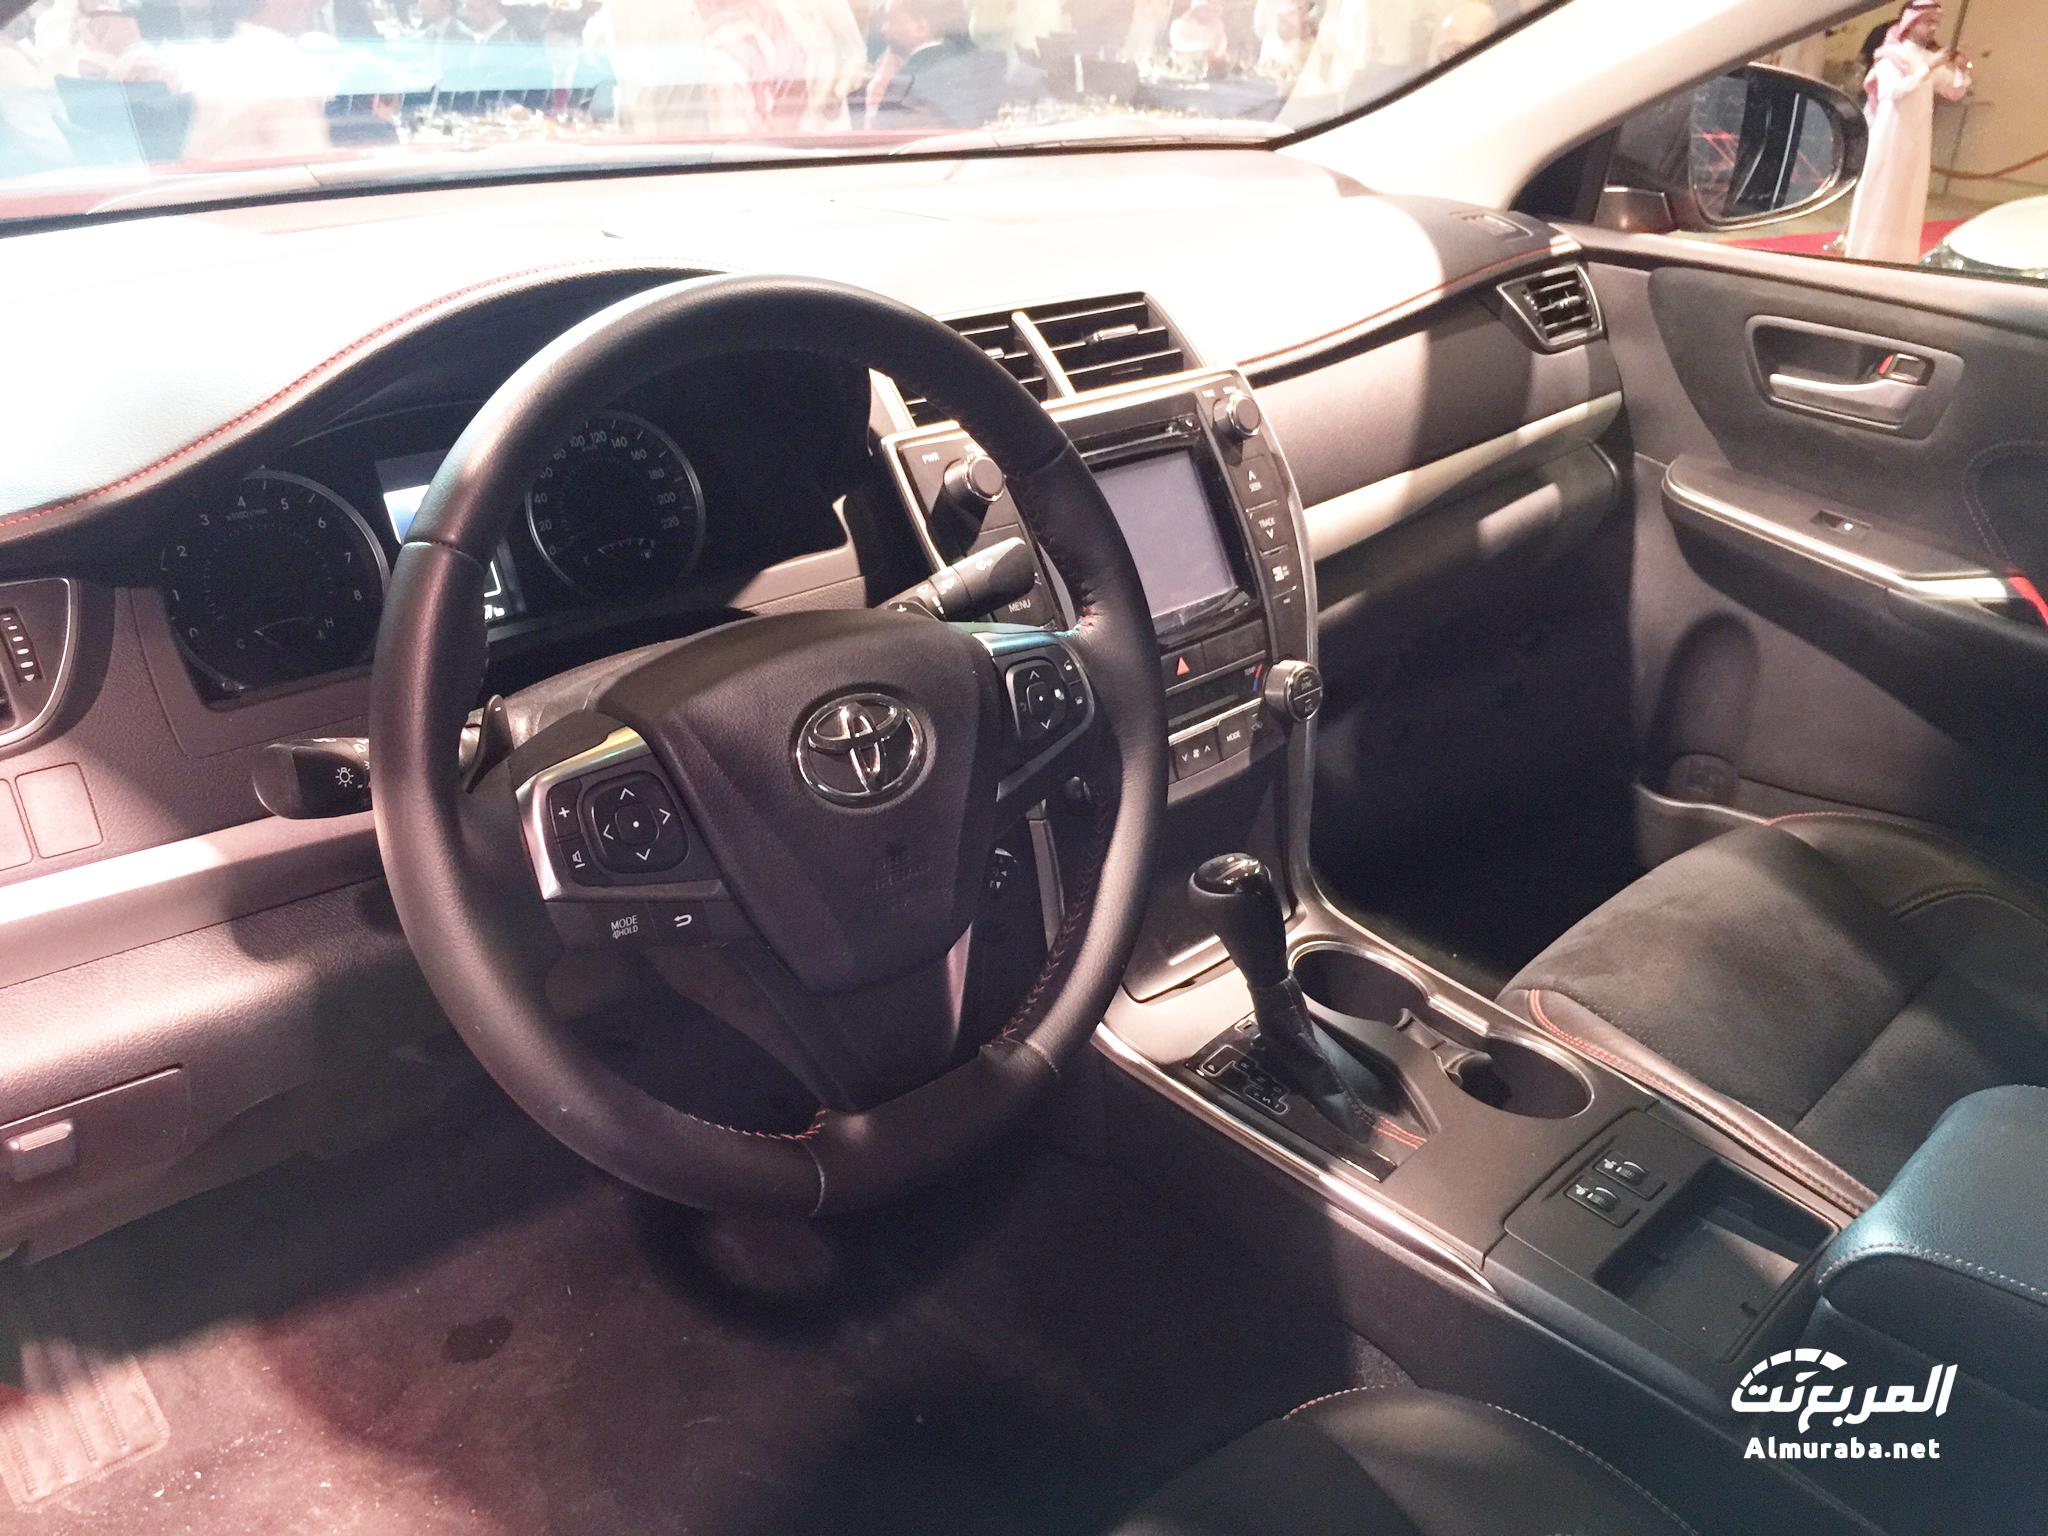 "2016 Toyota Camry Xse >> تدشين تويوتا كامري 2016 في السعودية ""تقرير وفيديو ومواصفات وصور واسعار"" Toyota Camry - المربع نت"